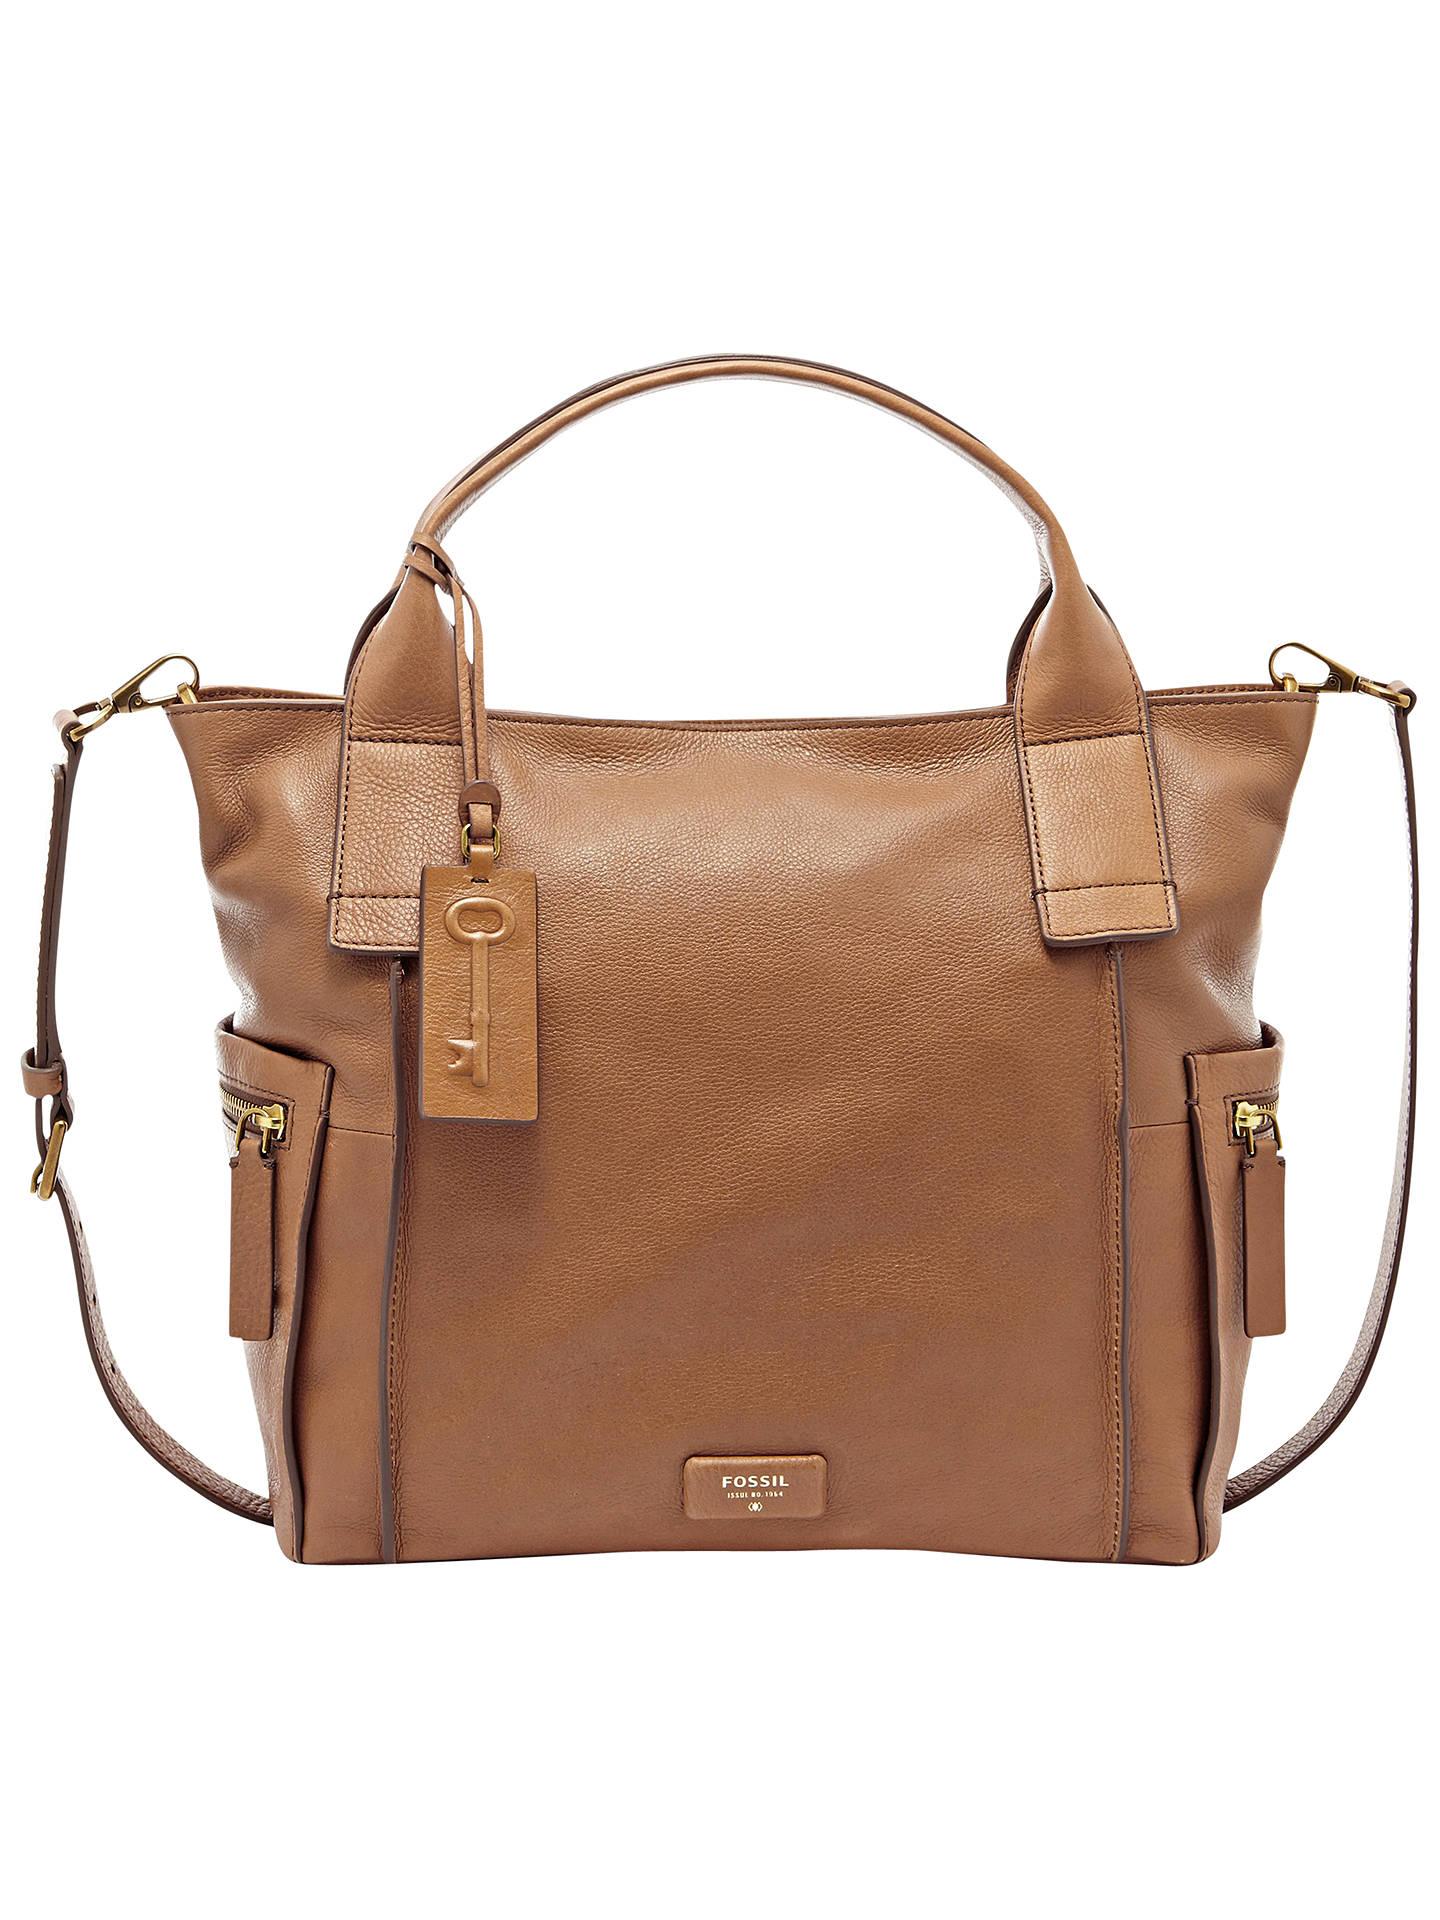 cc90cc046d5 Buy Fossil Emerson Leather Satchel Bag, Camel Online at johnlewis.com ...